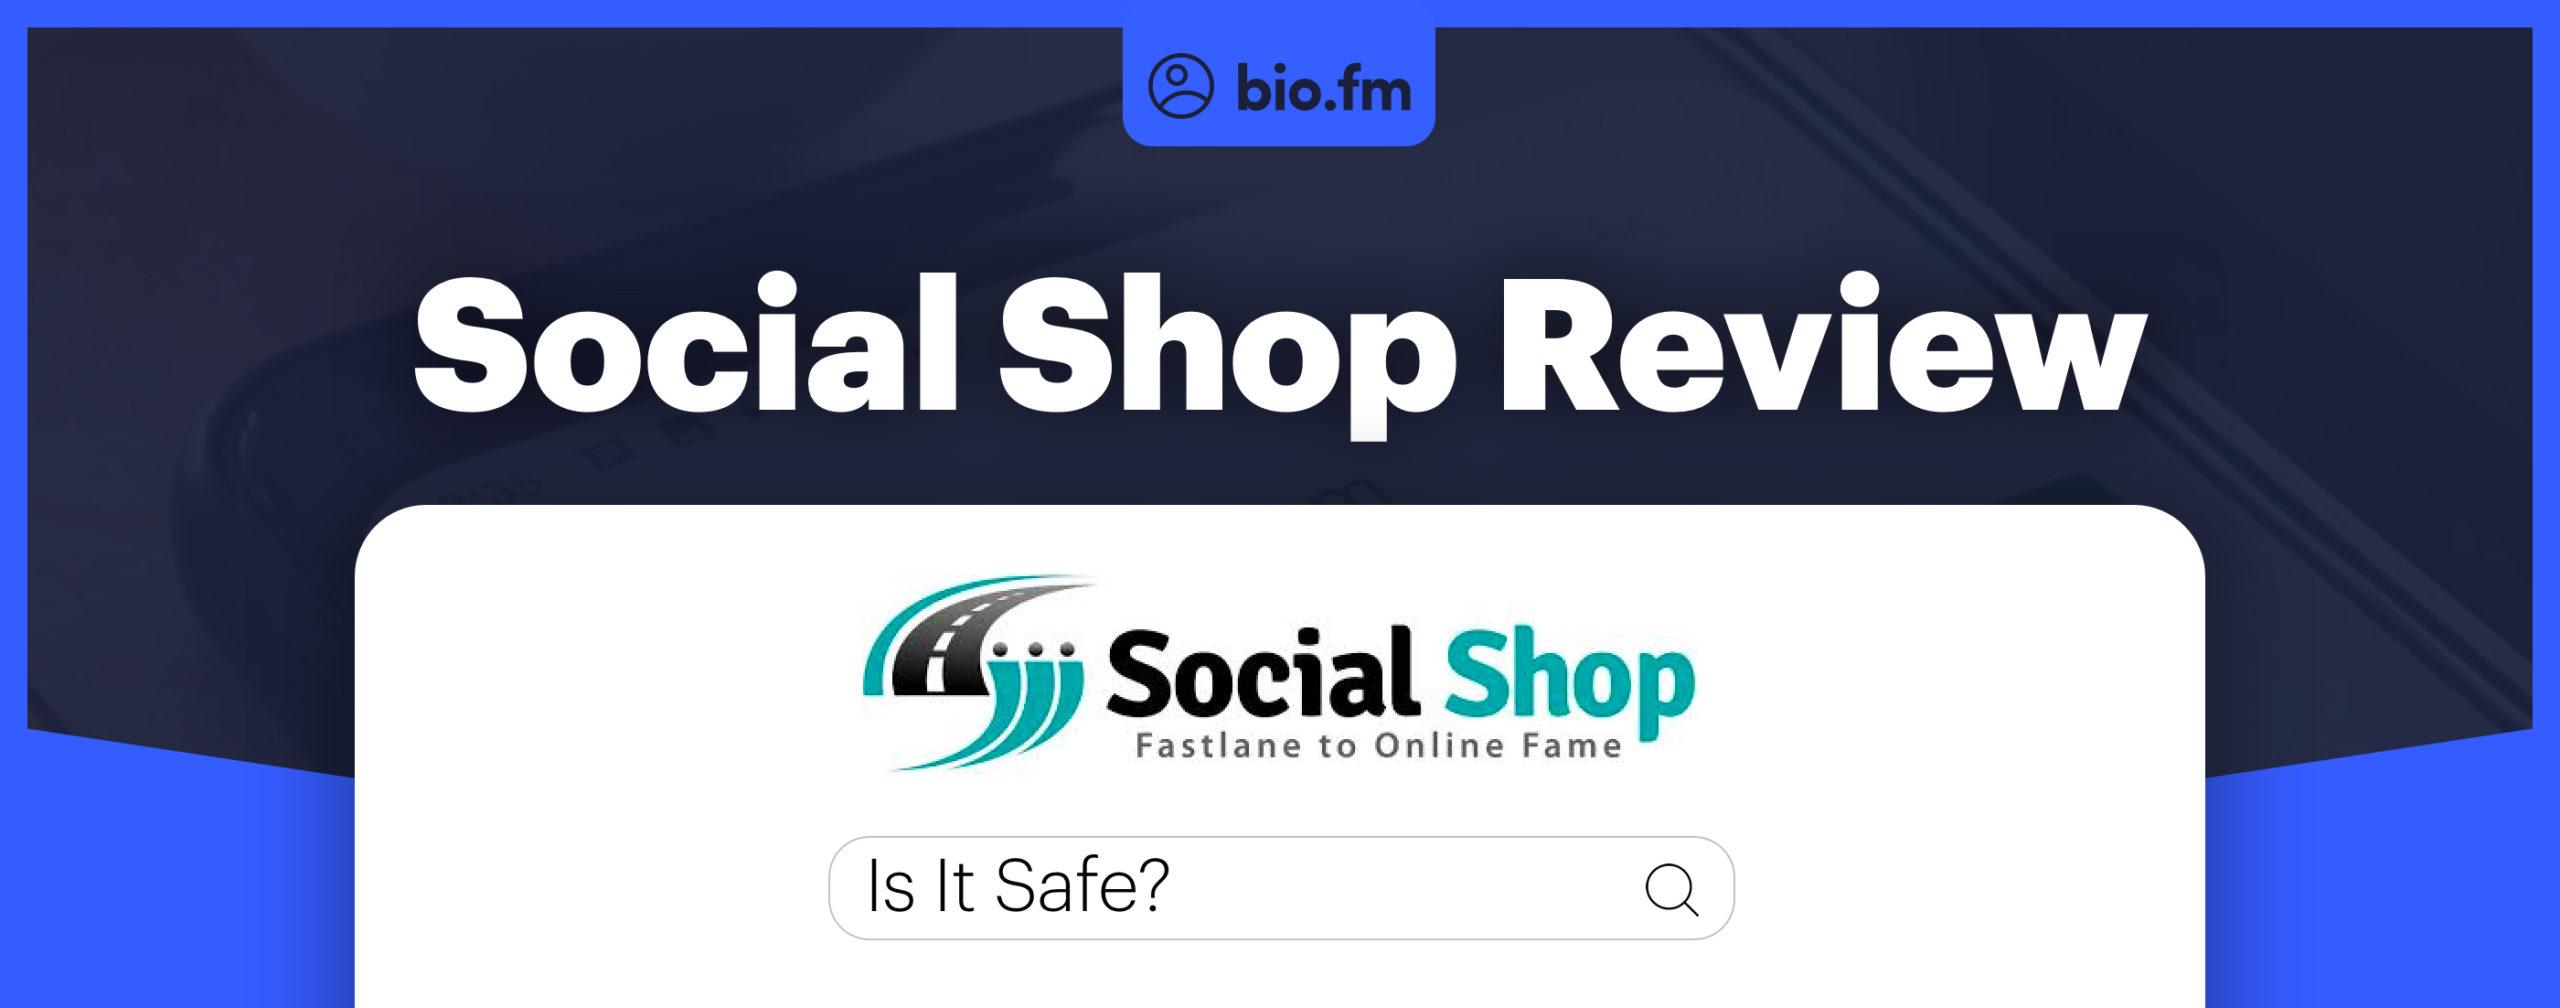 socialshop review featured image